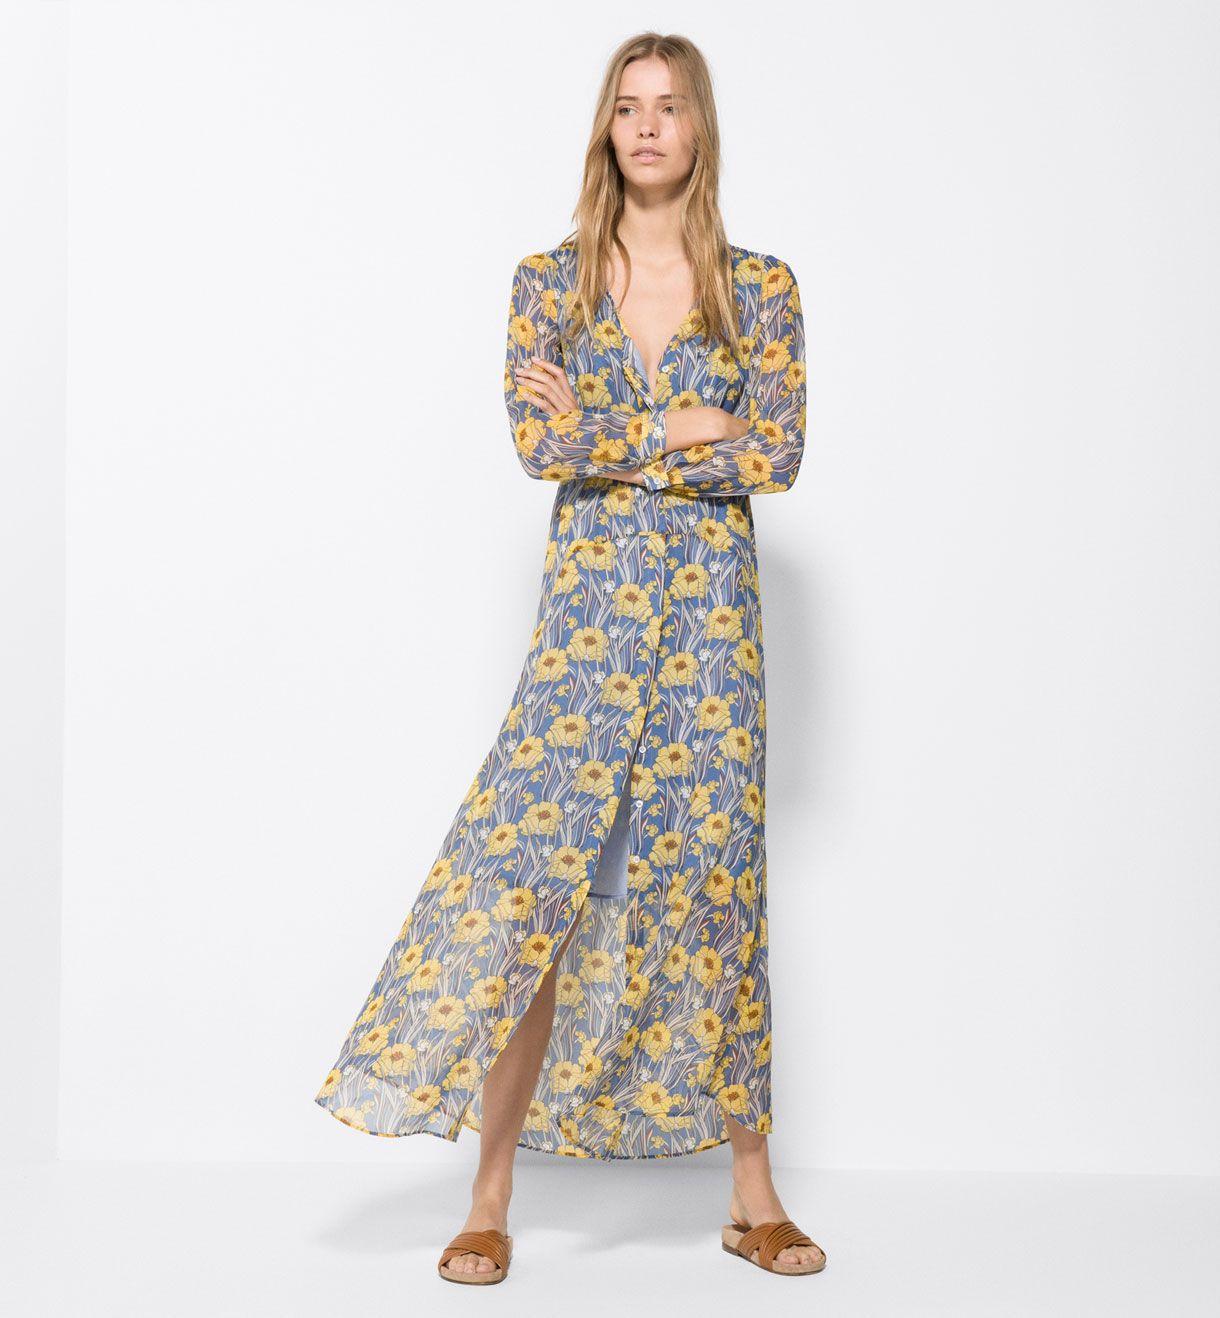 Robe Longue Imprime Fleurs In Store To Find Pinterest Dresses